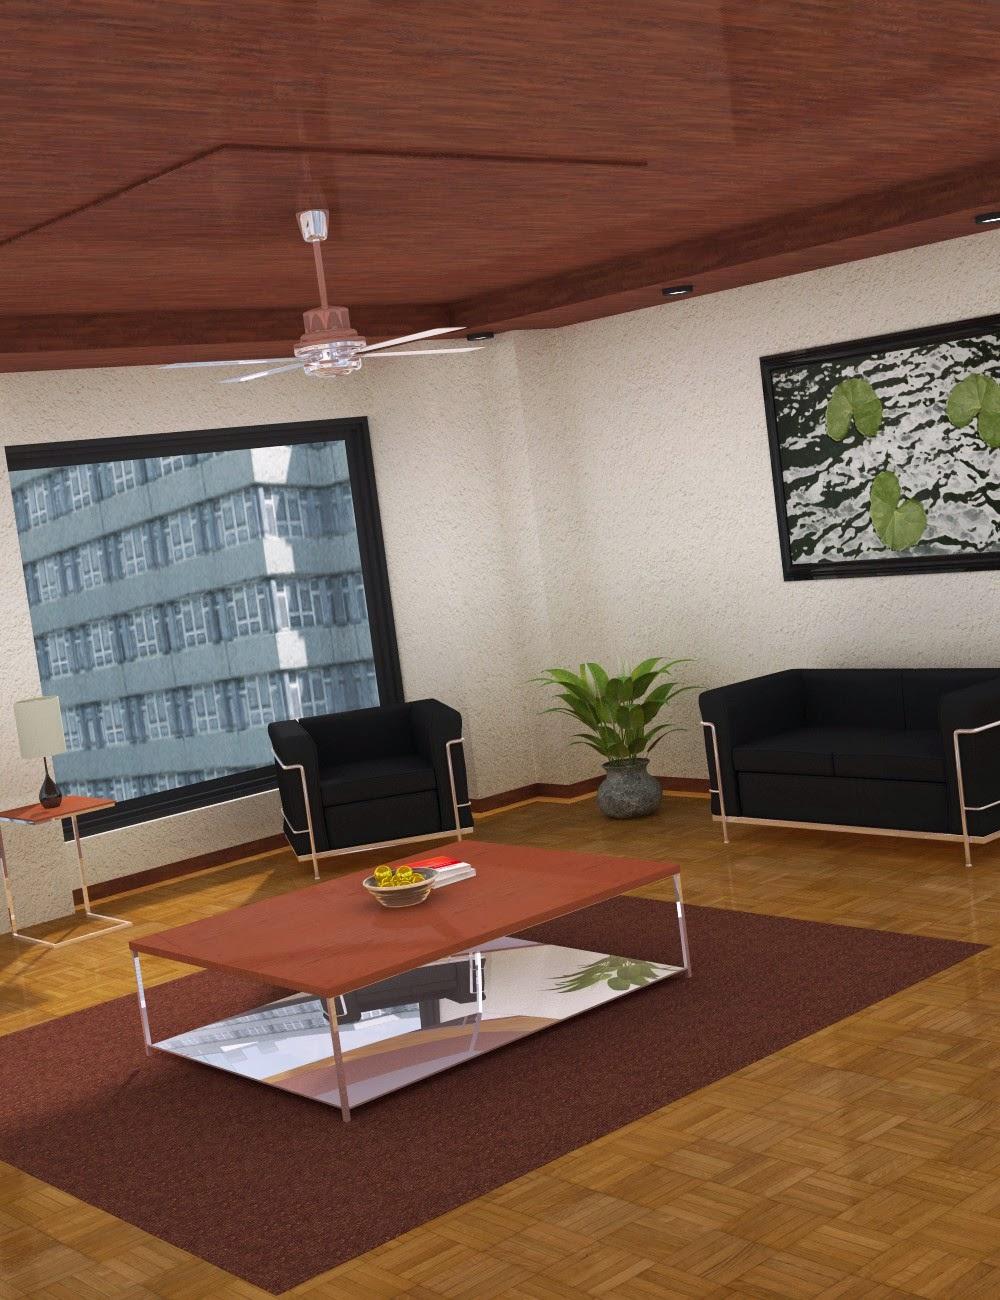 3d Room Interior Design: Download DAZ Studio 3 For FREE!: DAZ 3D